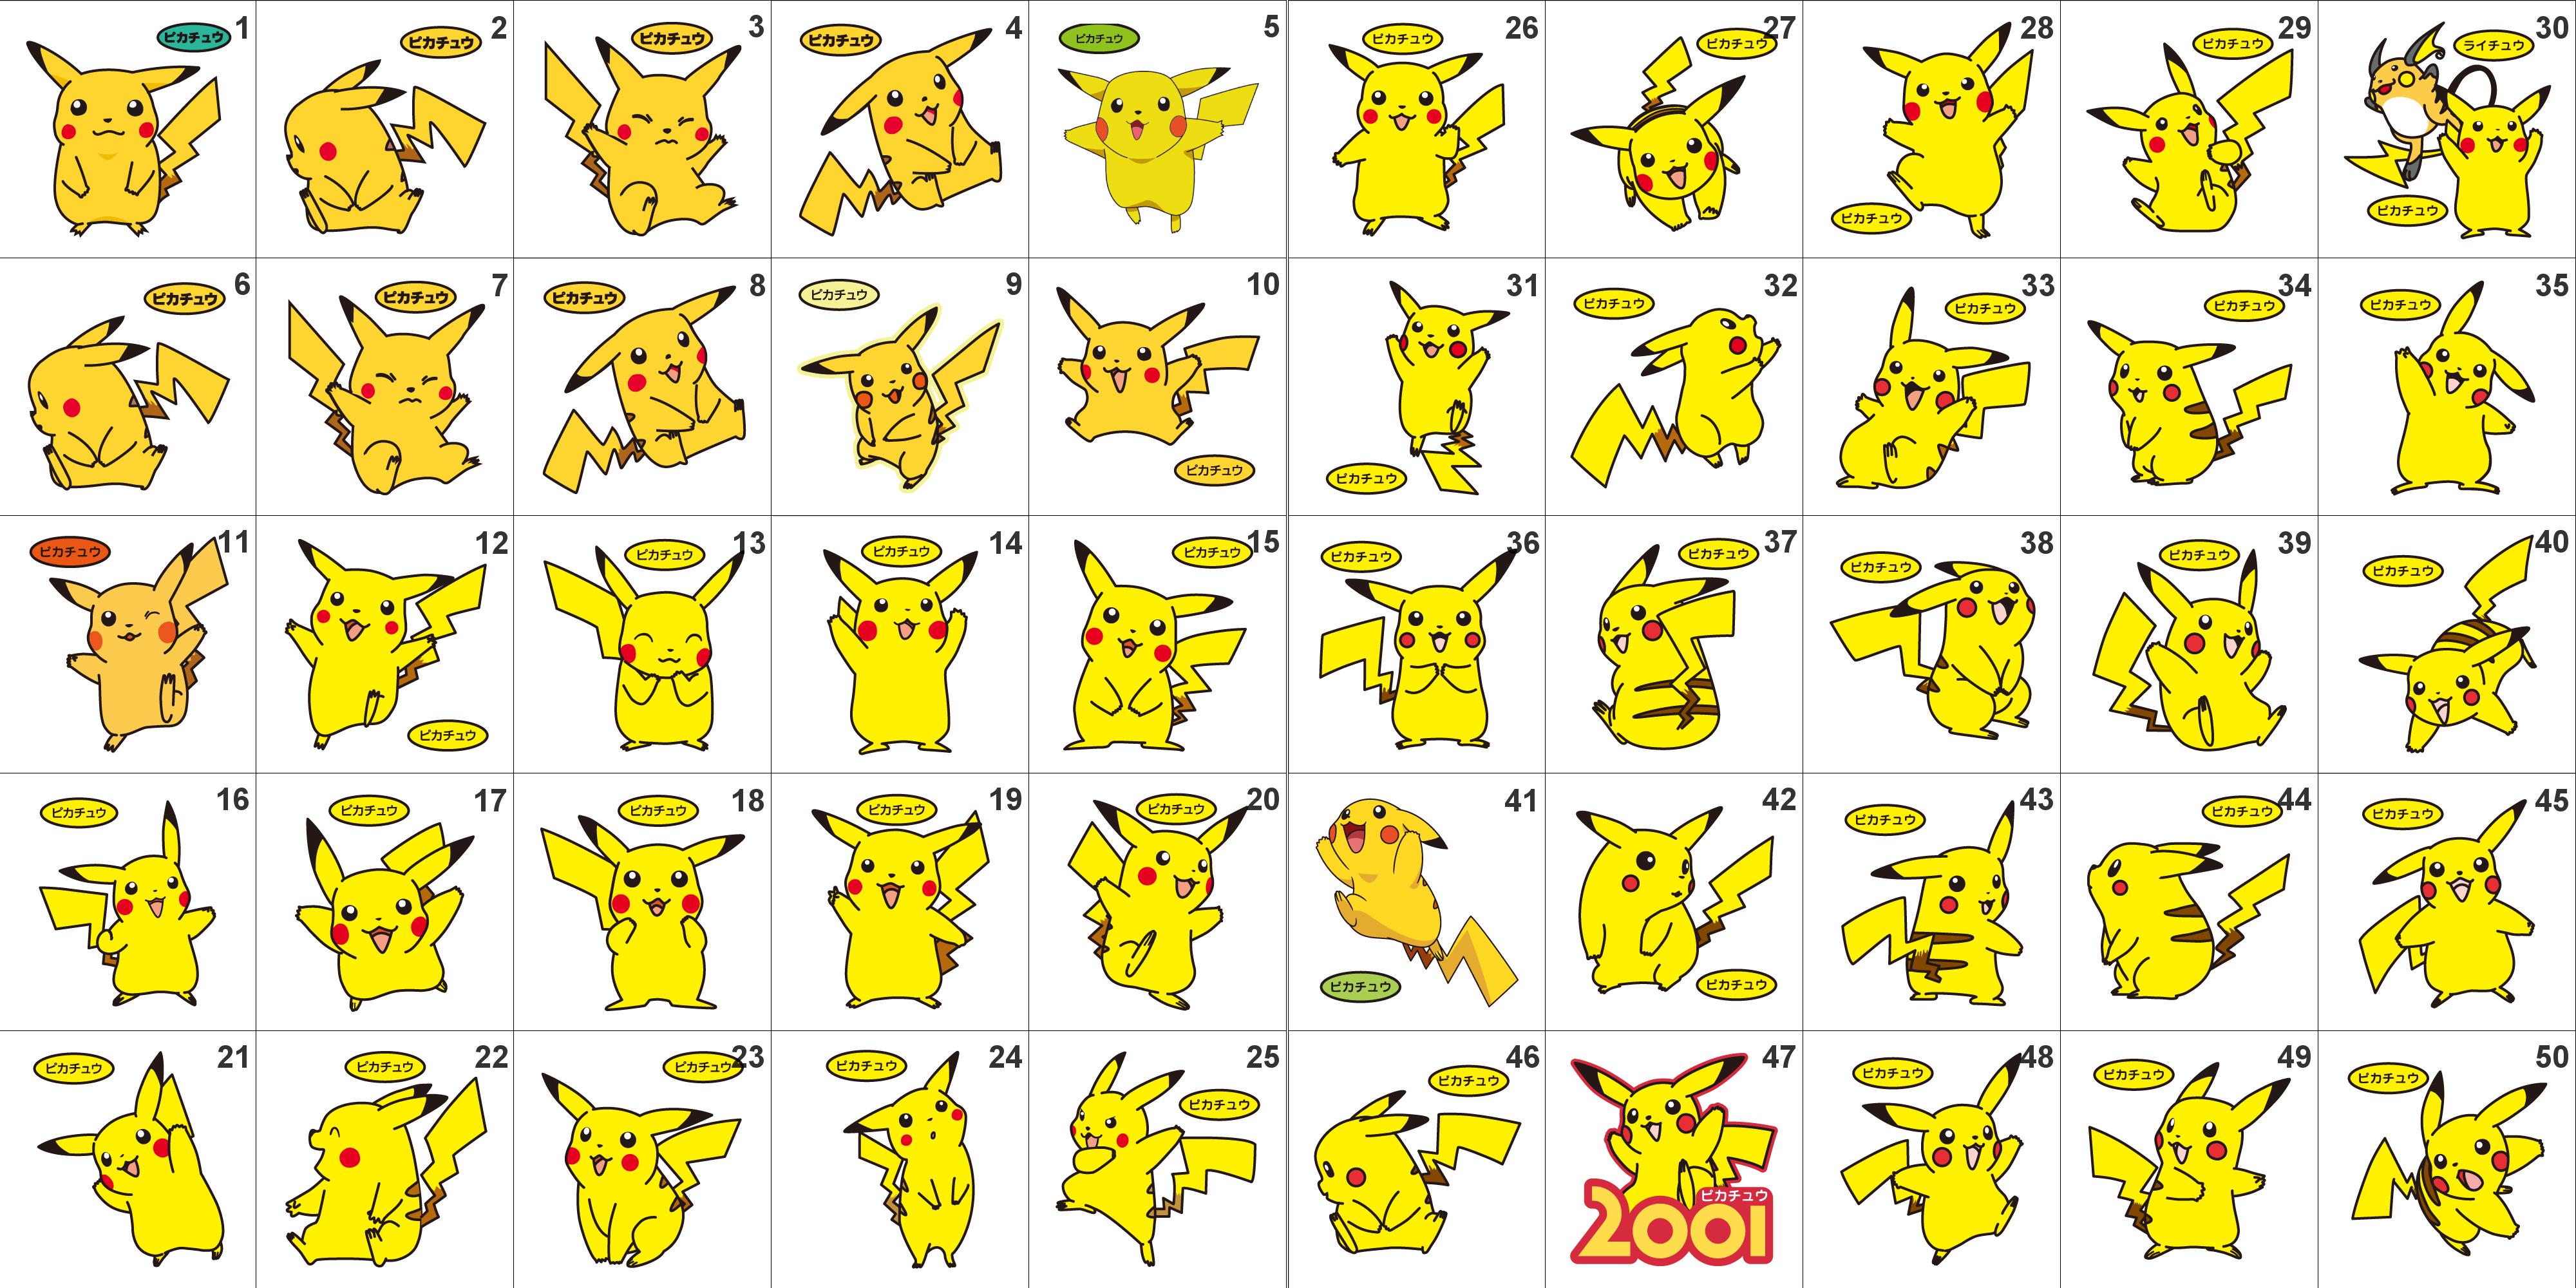 Stickers Pokemon.025 Pikachu Pan Stickers Pokemon Splash S Pan Stickers